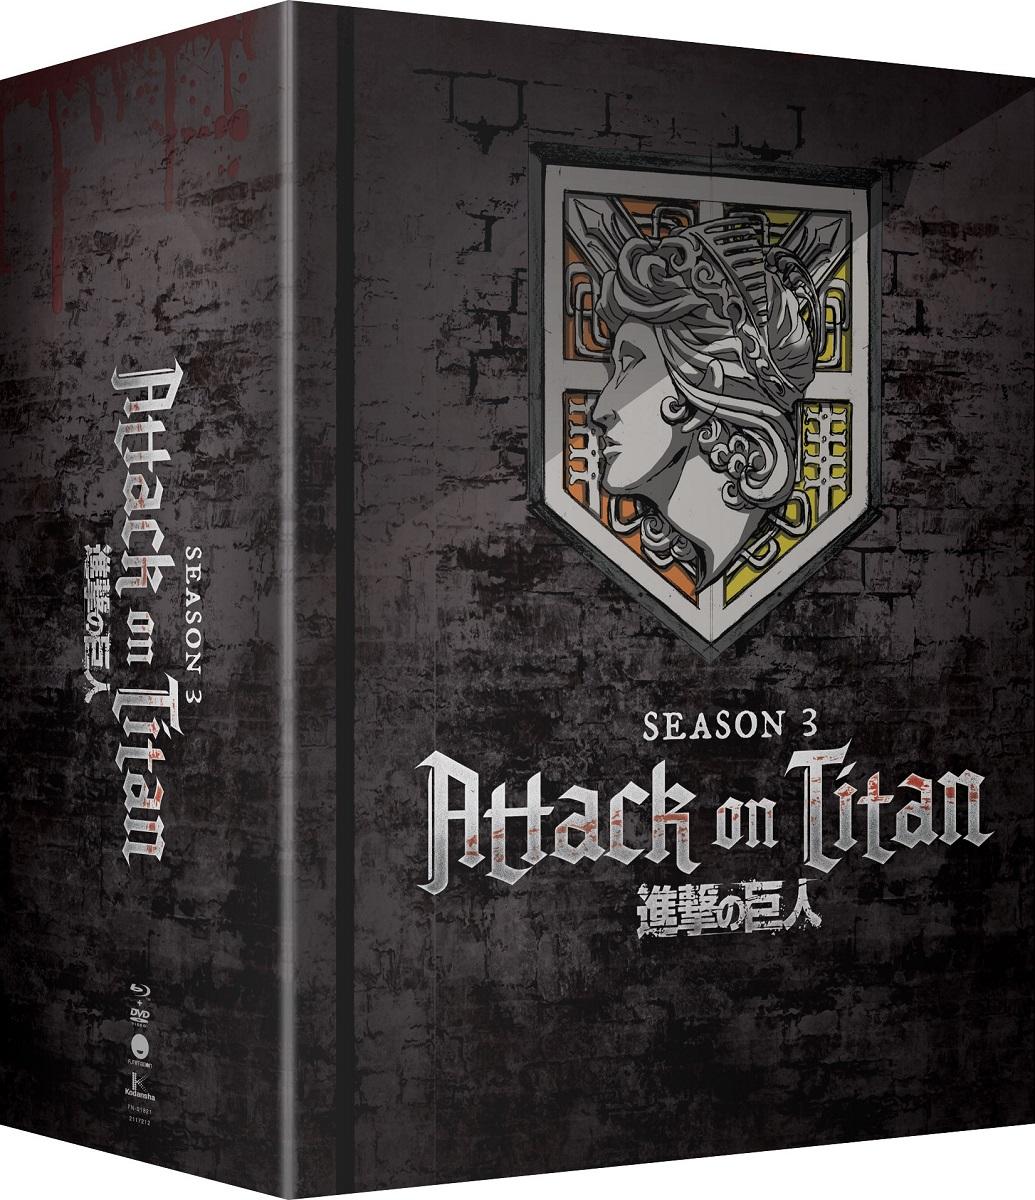 Attack on Titan Season 3 Part 1 Limited Edition Blu-ray/DVD